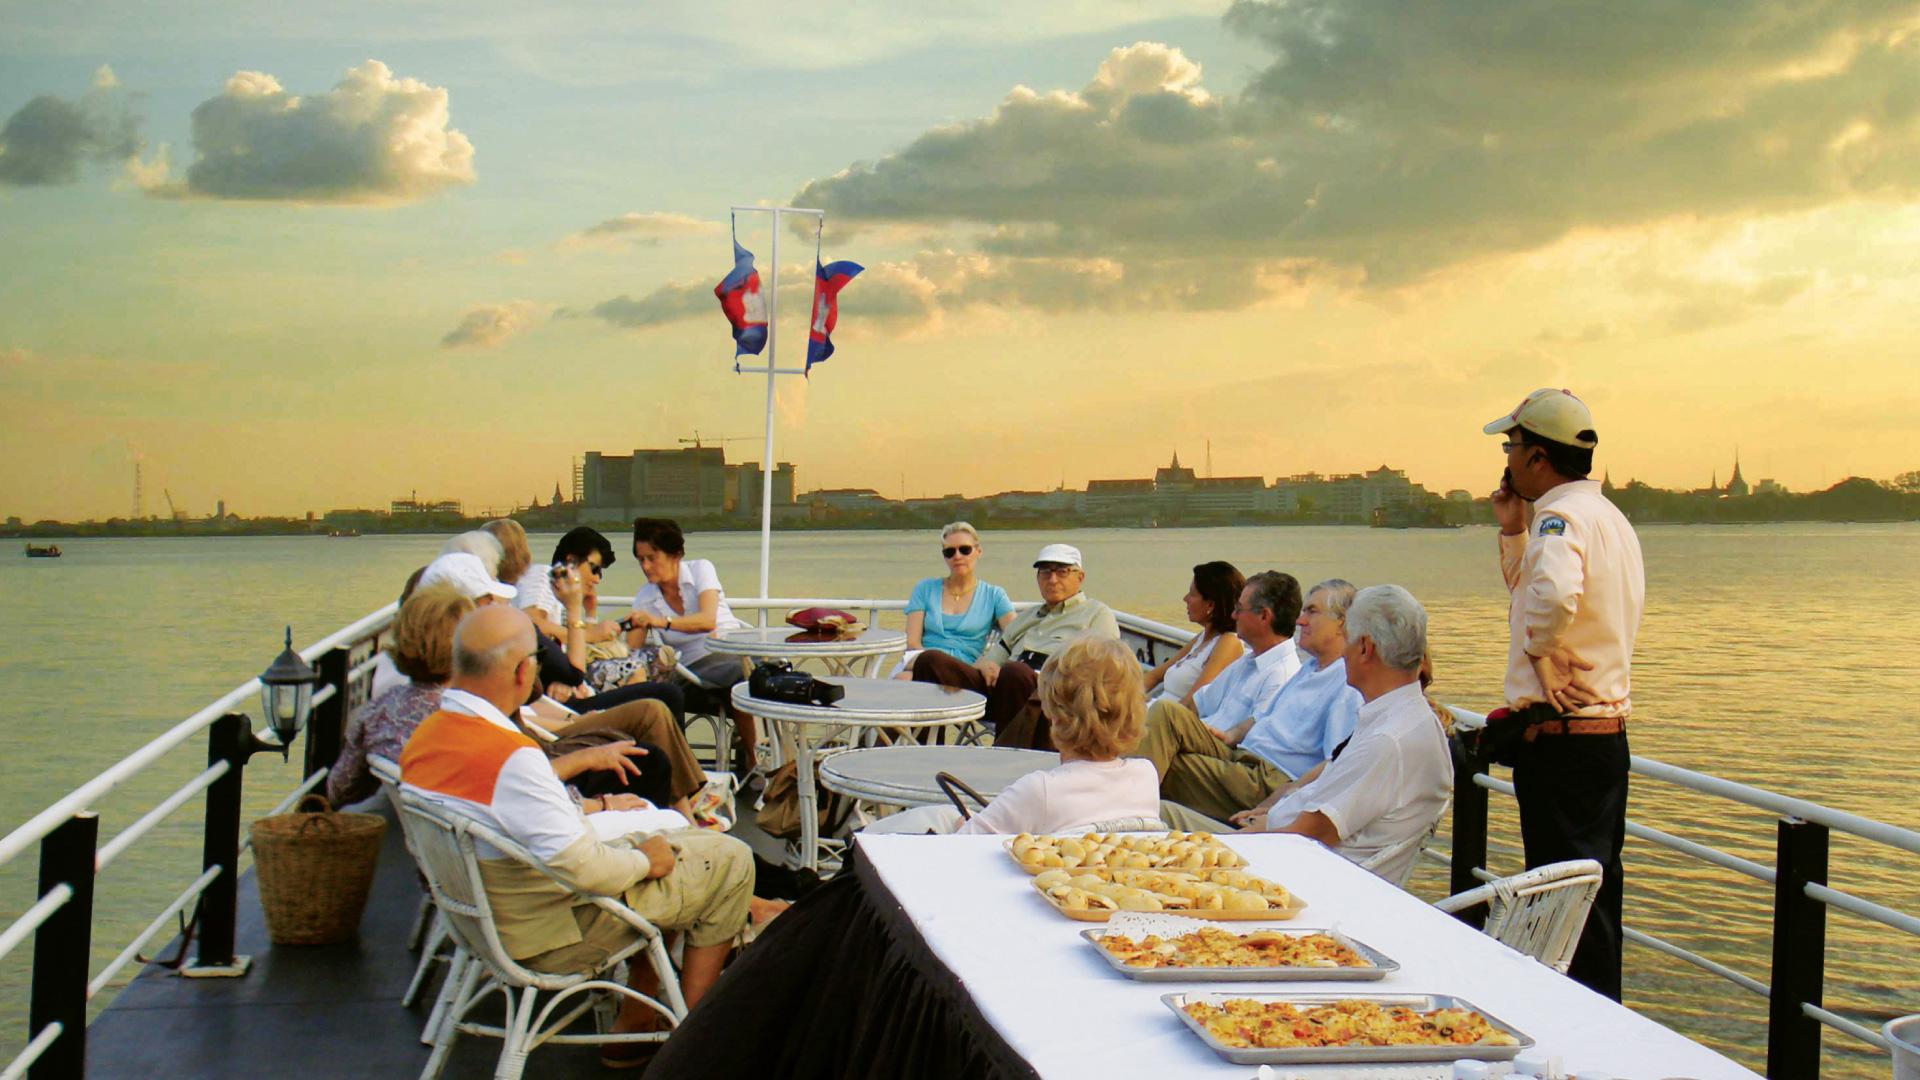 Take boat rides on the Tonlé Sap